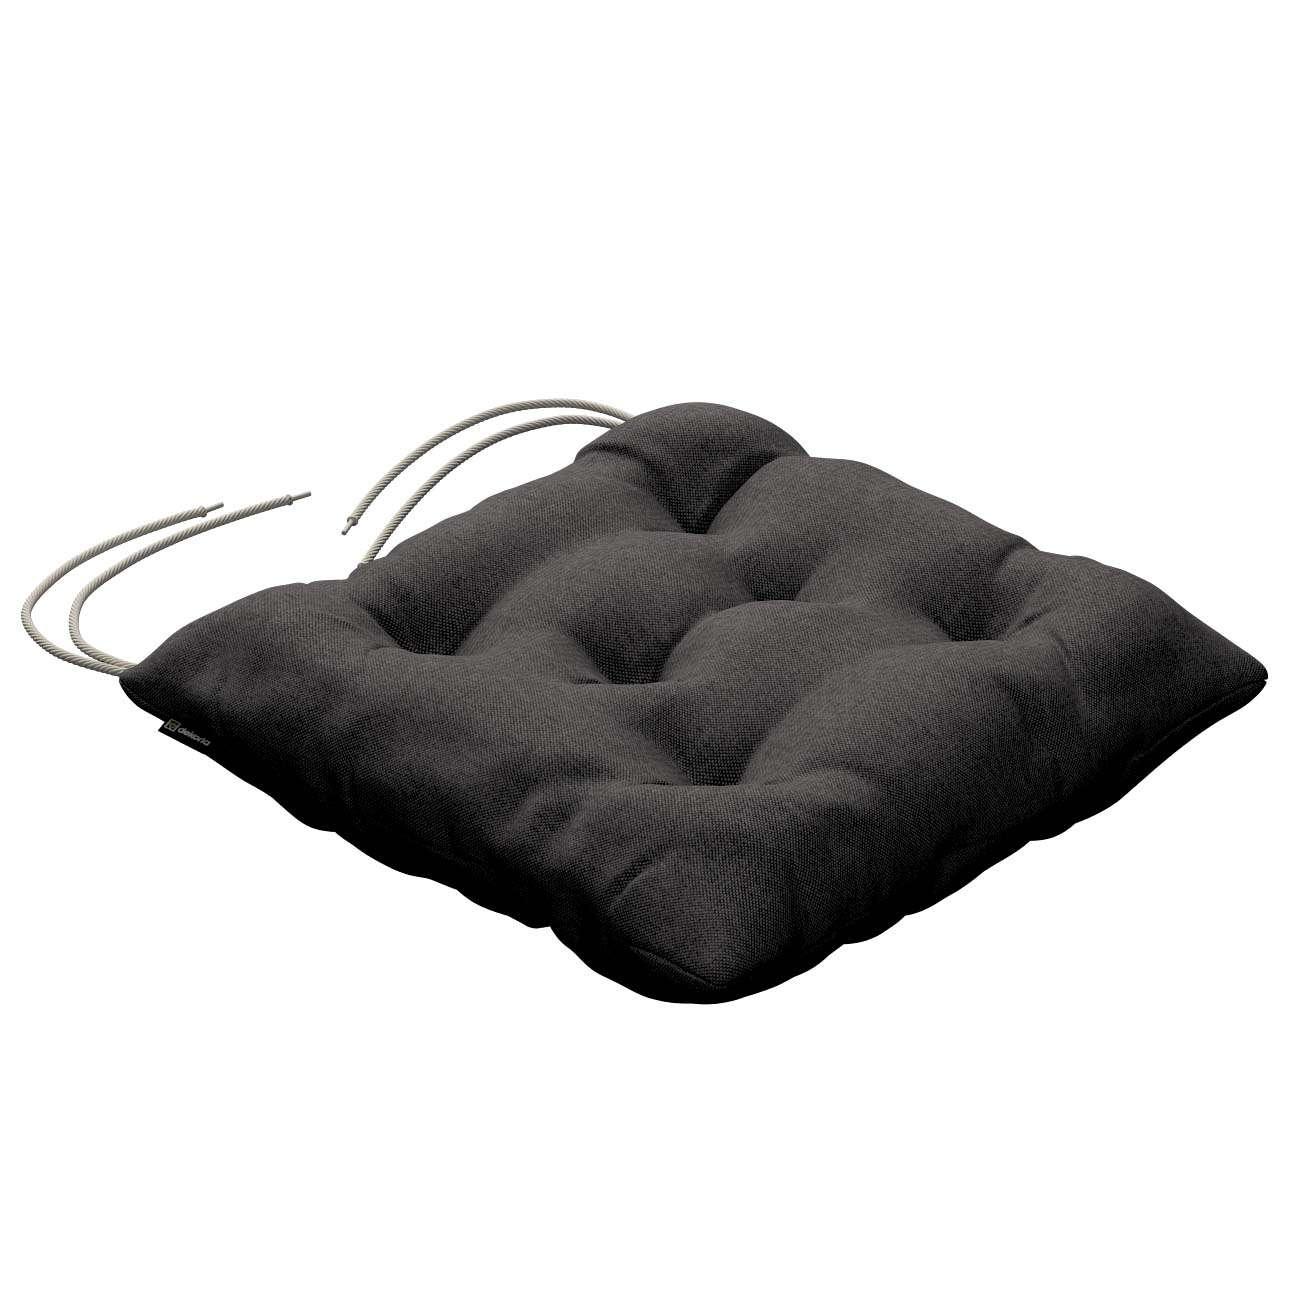 Kėdės pagalvėlė Jacek  40 x 40 x 8 cm kolekcijoje Etna , audinys: 705-35